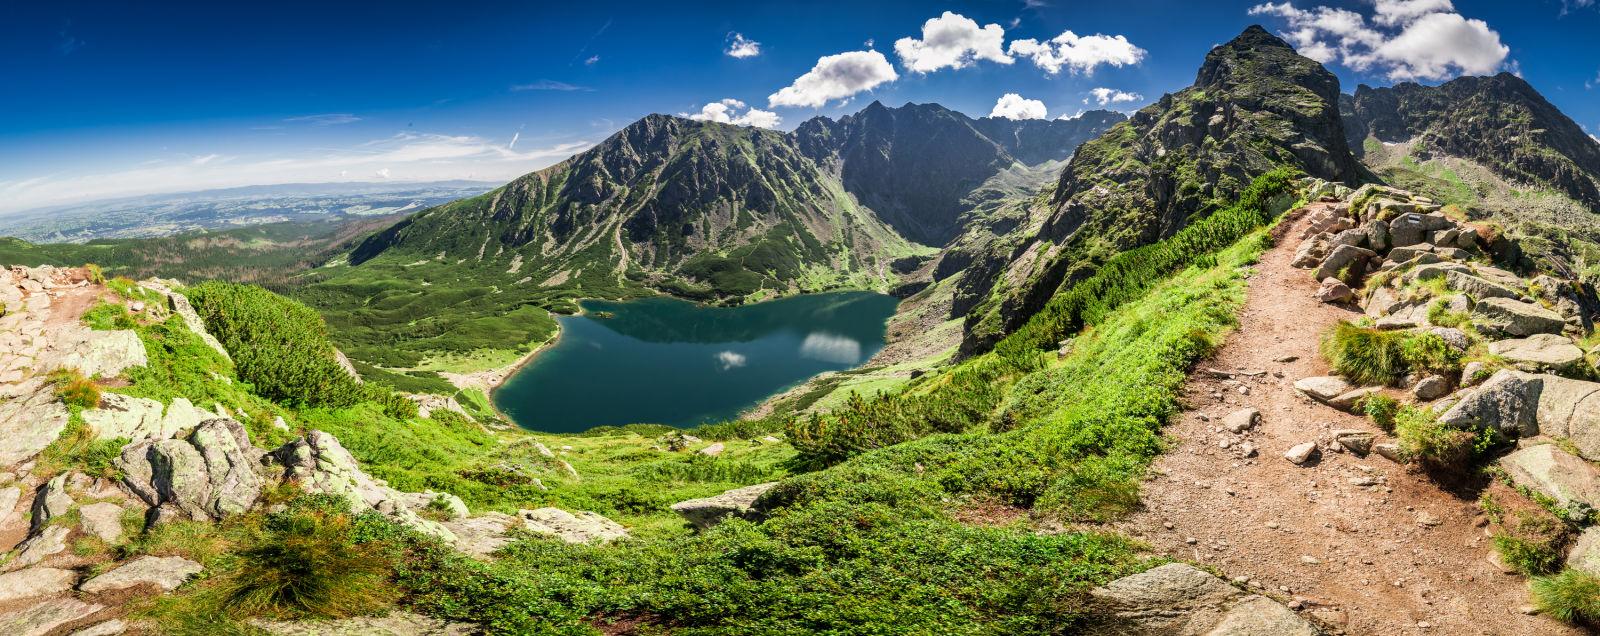 Hohe Tatra Berge Polen Natur See